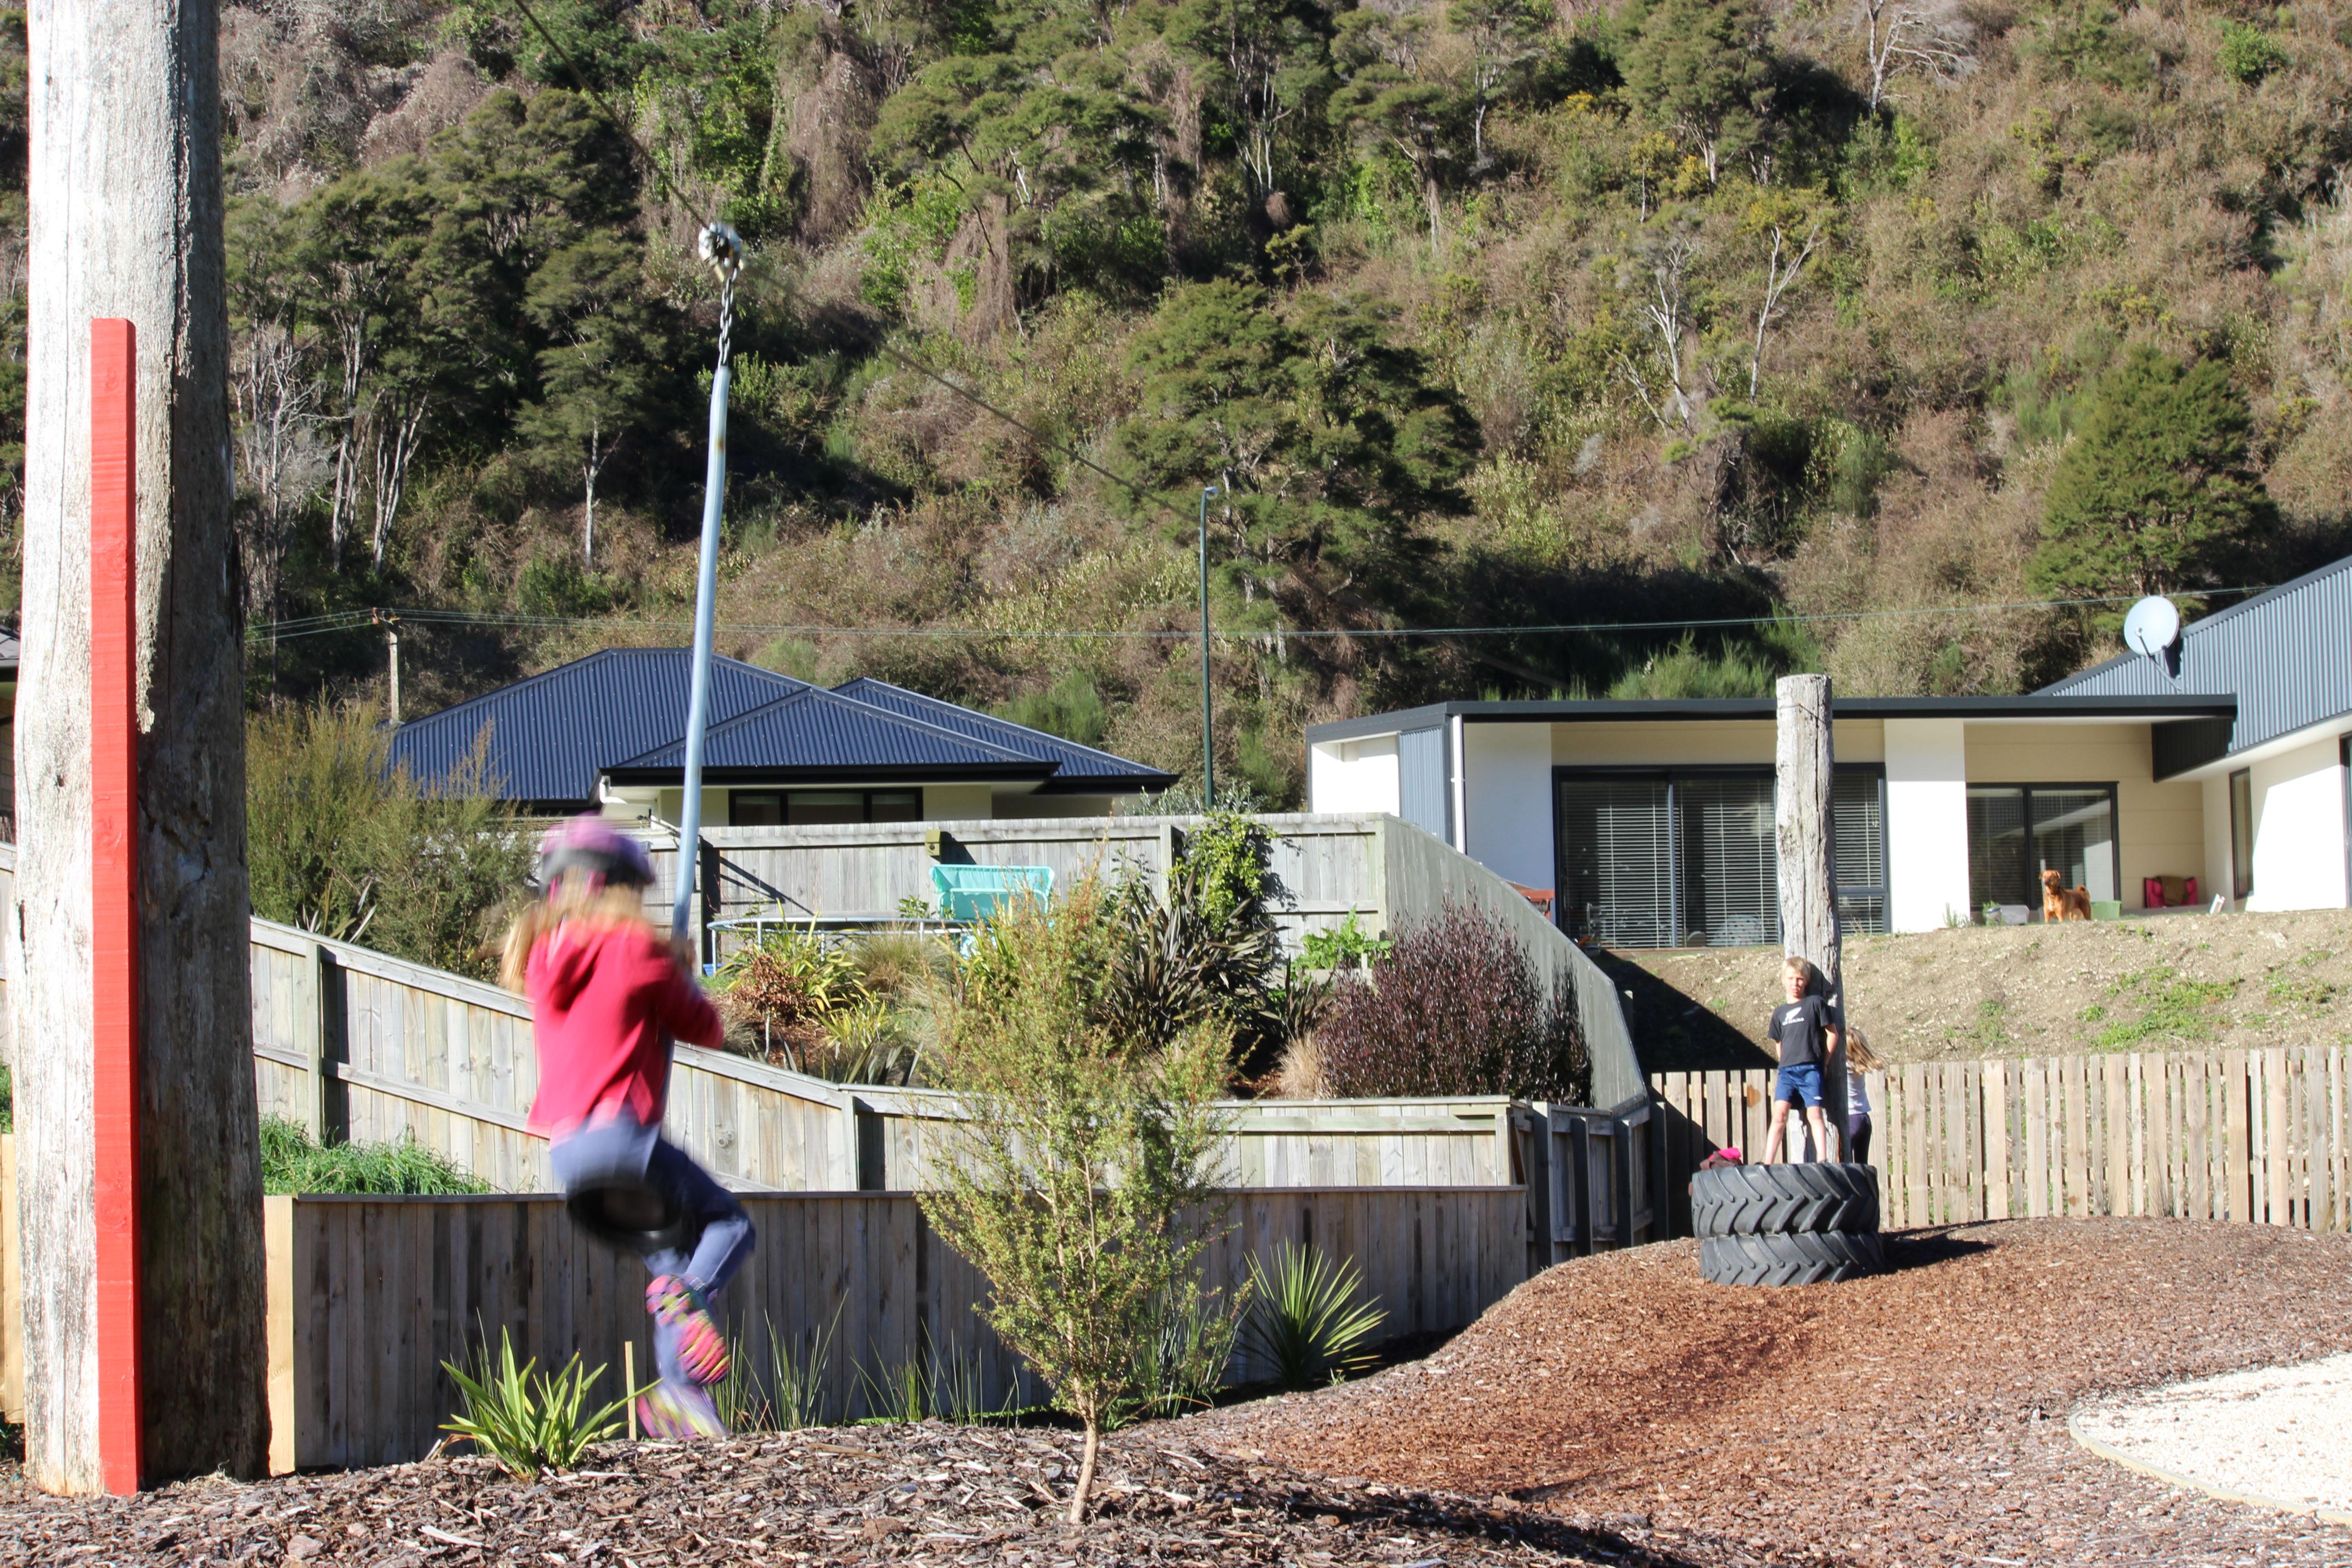 Follow leader riding kids Waimarama sanctuary flyin fox goRide